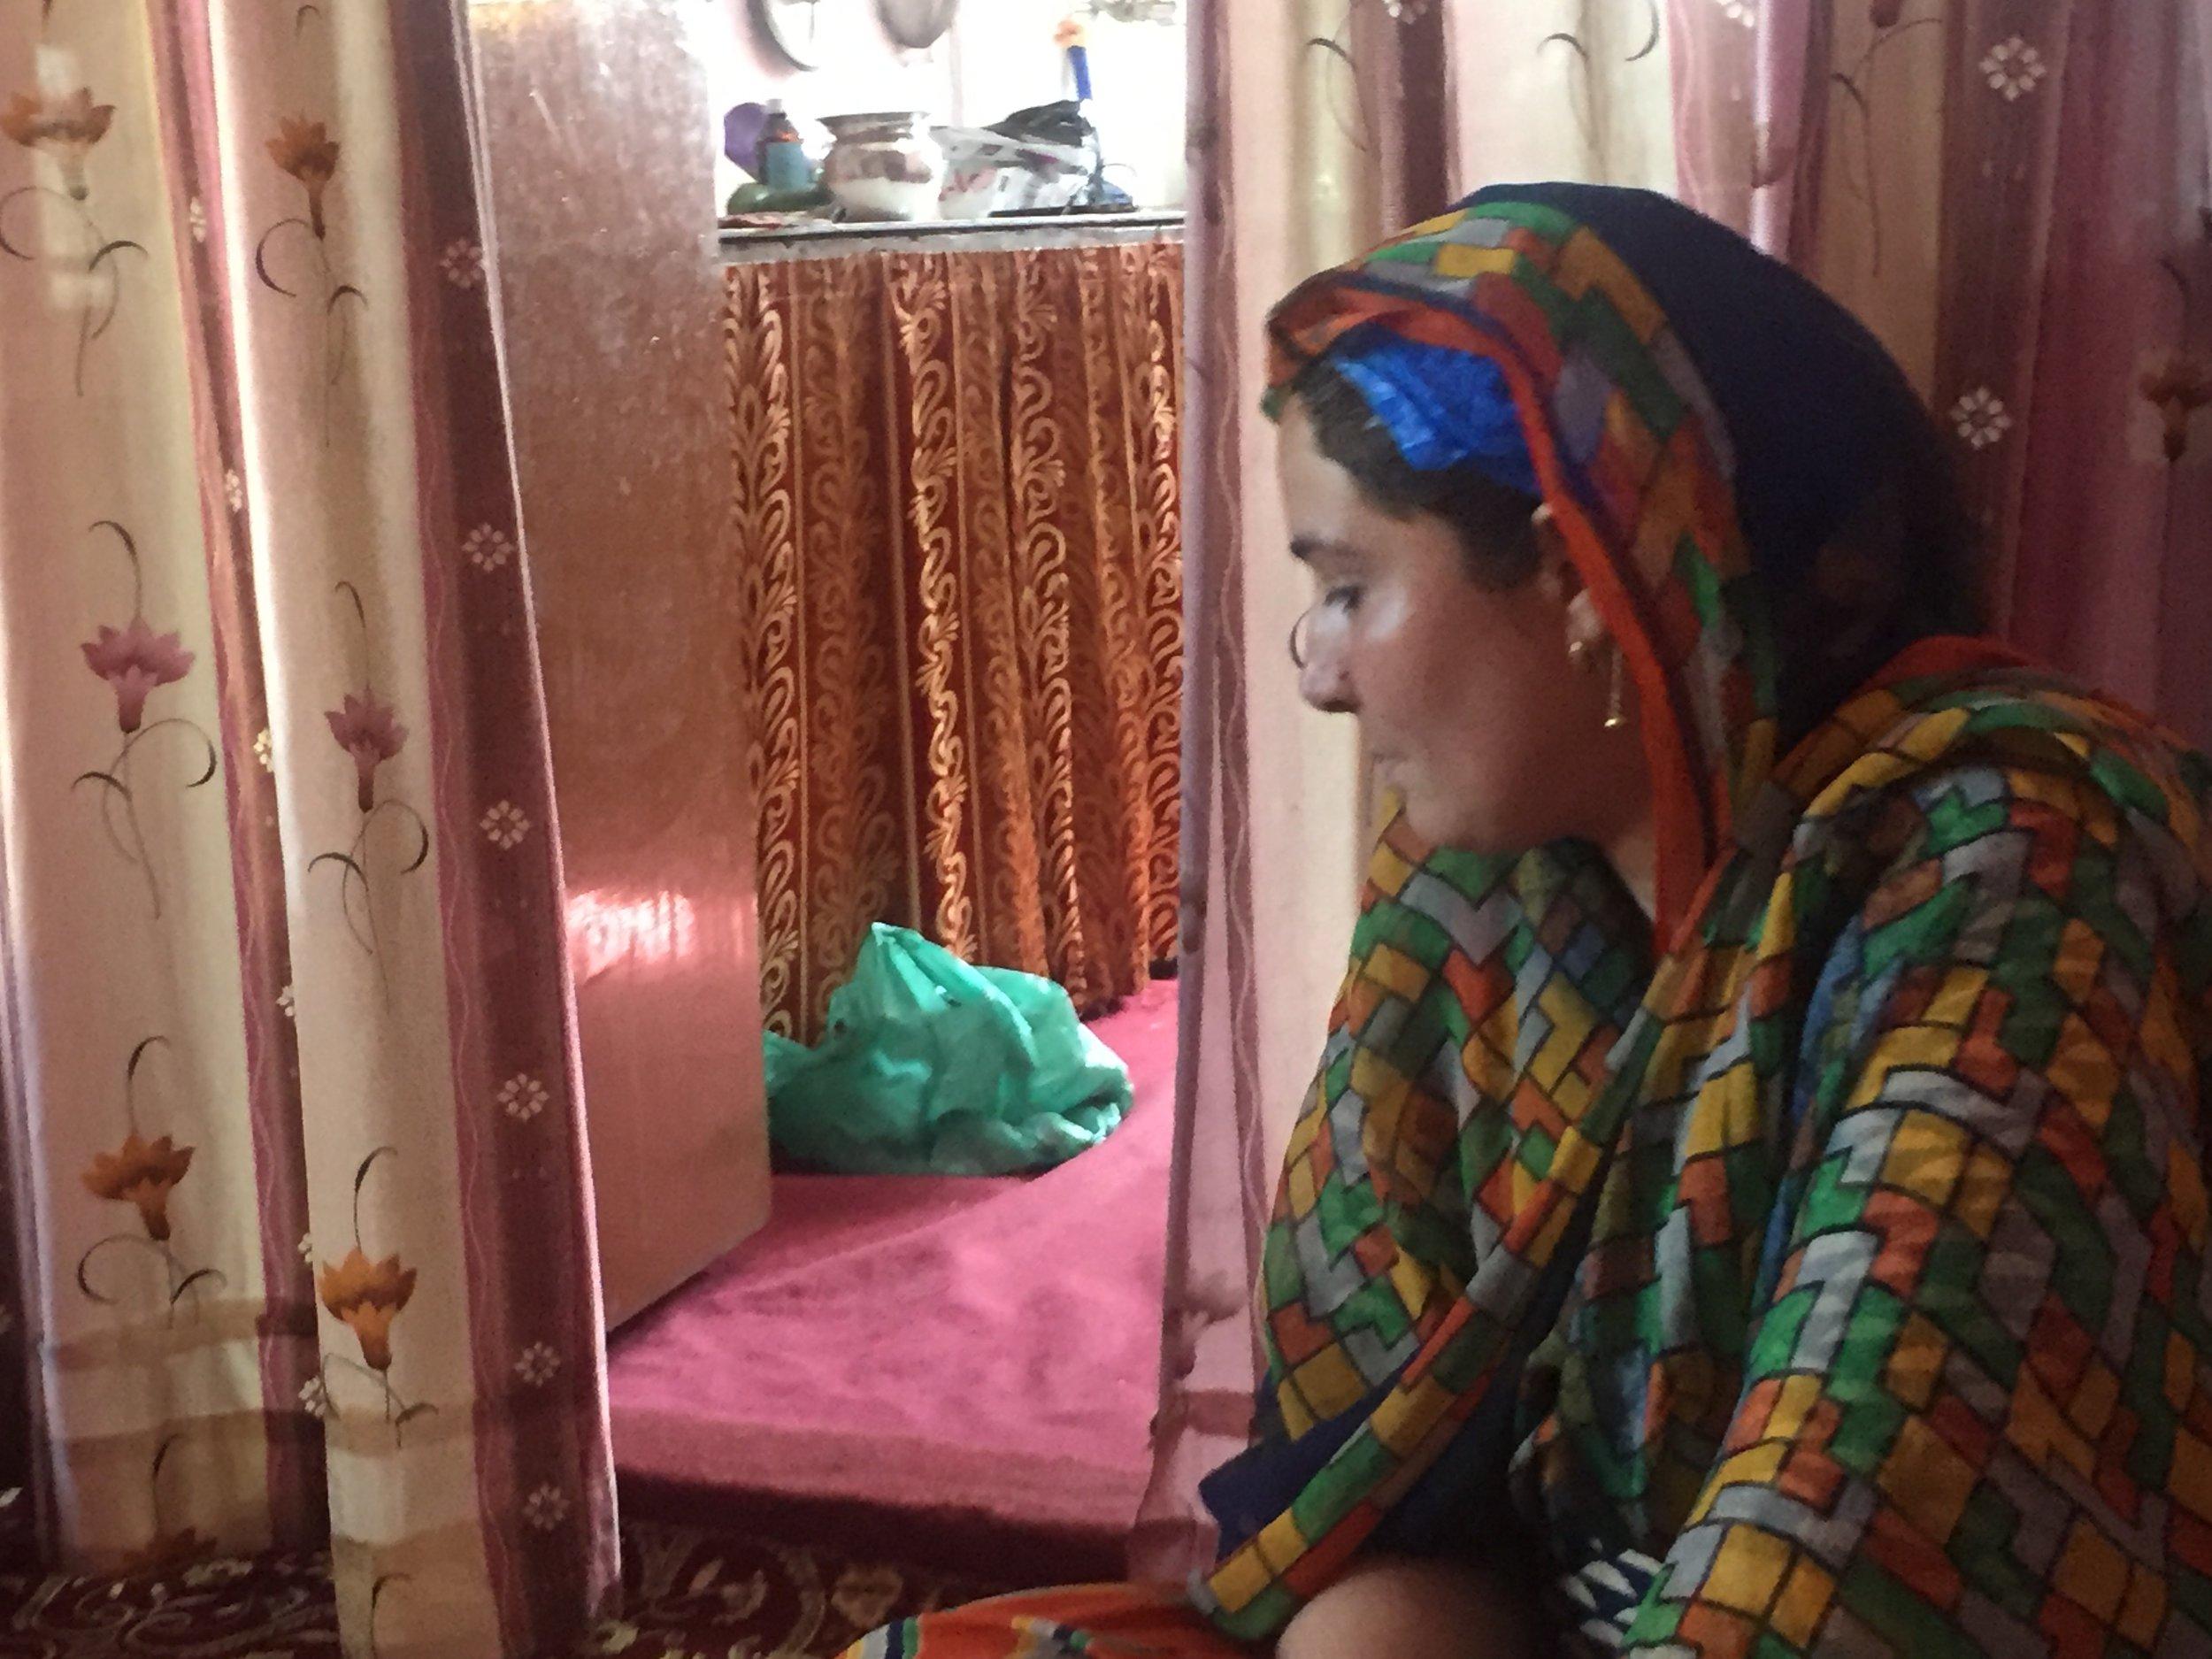 Kashmiri Pandit Babita in her two room tenement at Kashmiri Pandit Colony in Budgam, Kashmir. Photo by Taha Zahoor.